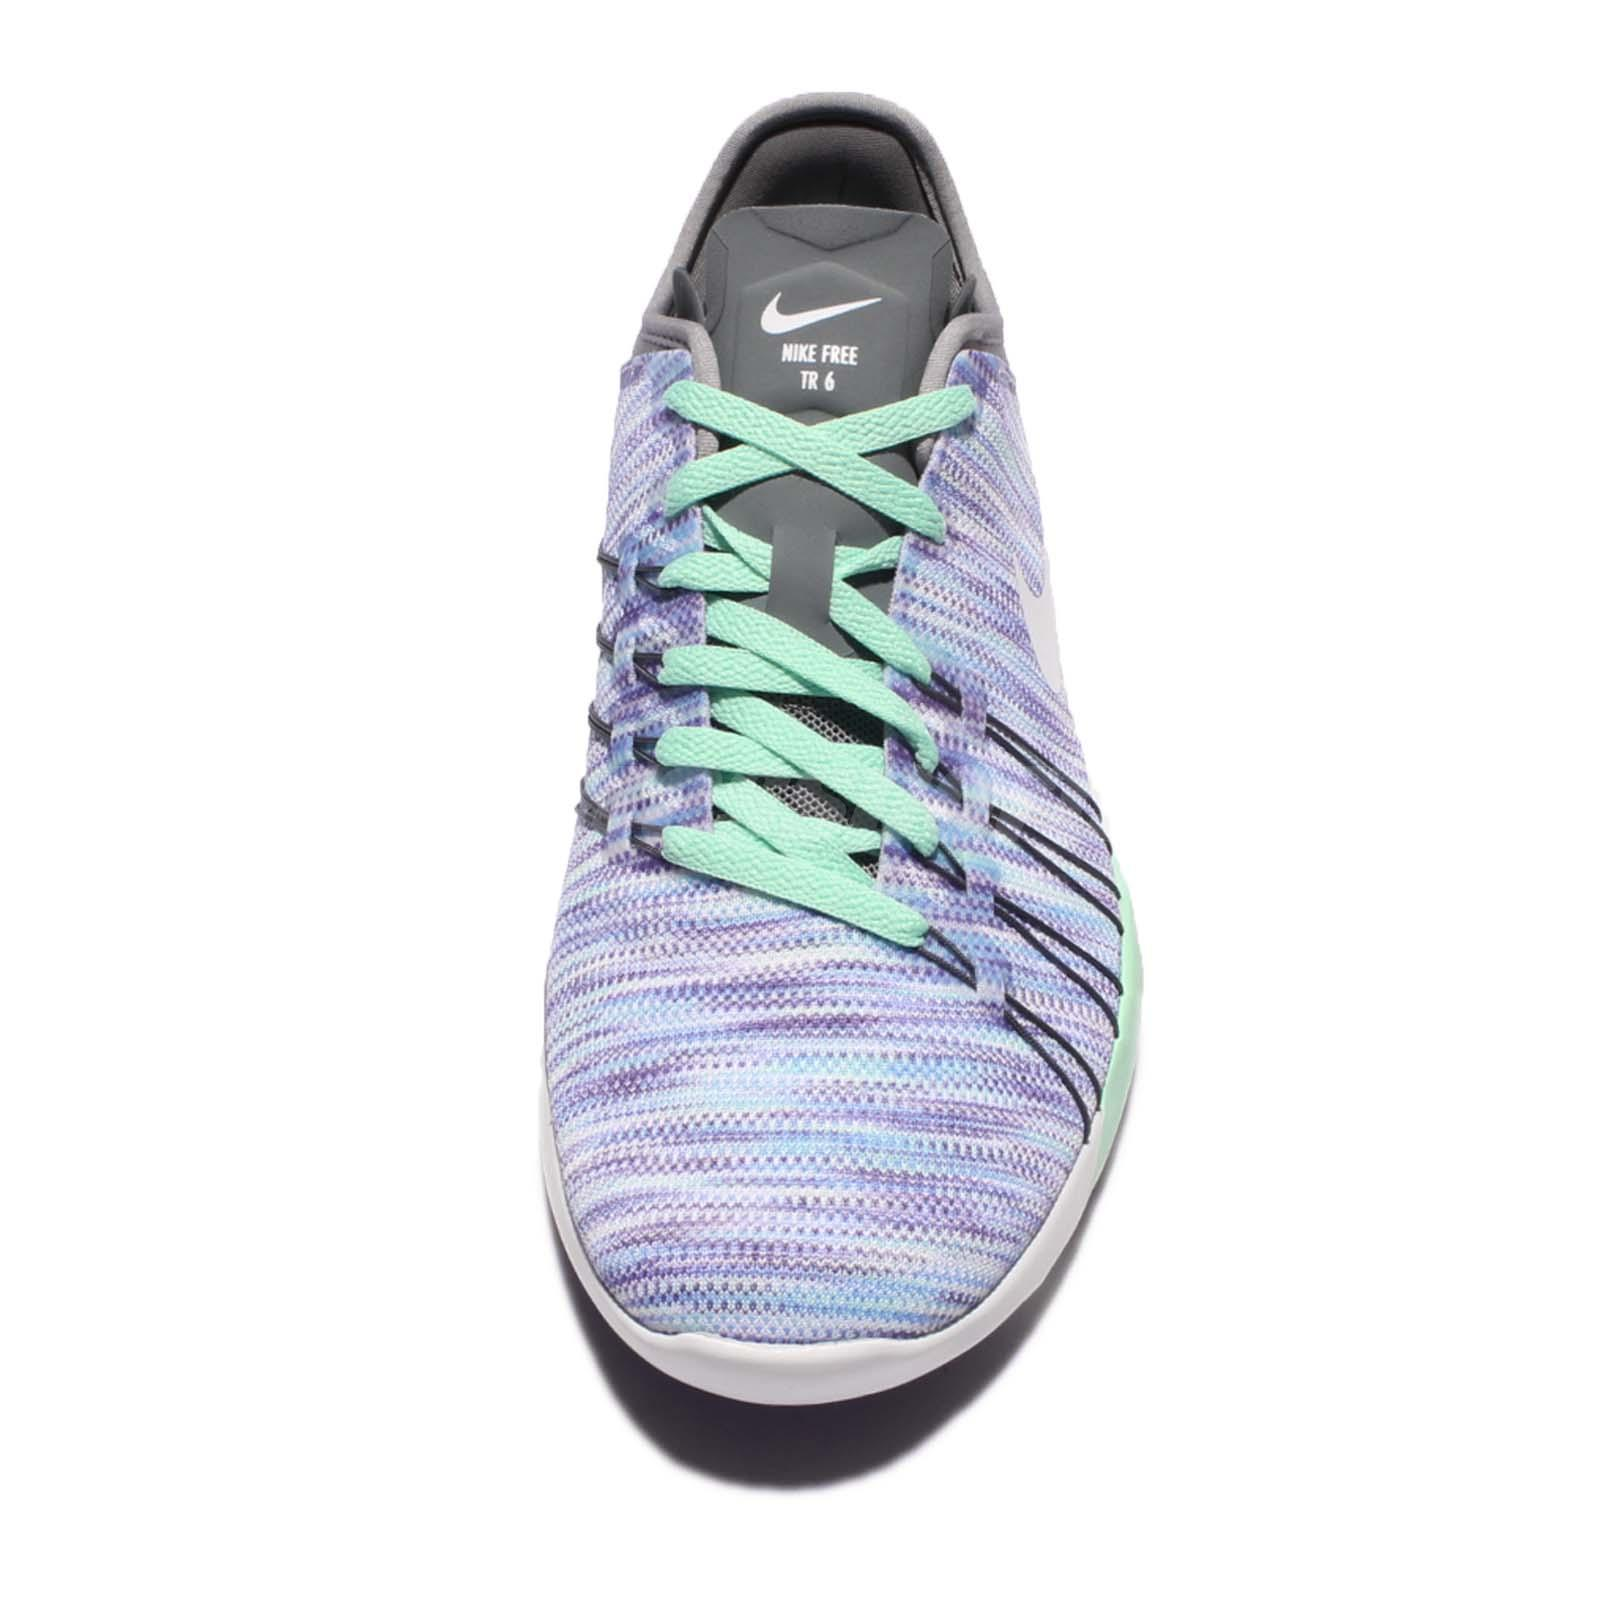 new product c98f7 8ae18 Nike Wmns Free TR 6 AMP VI Hyper Grape Grey Women Cross Trai